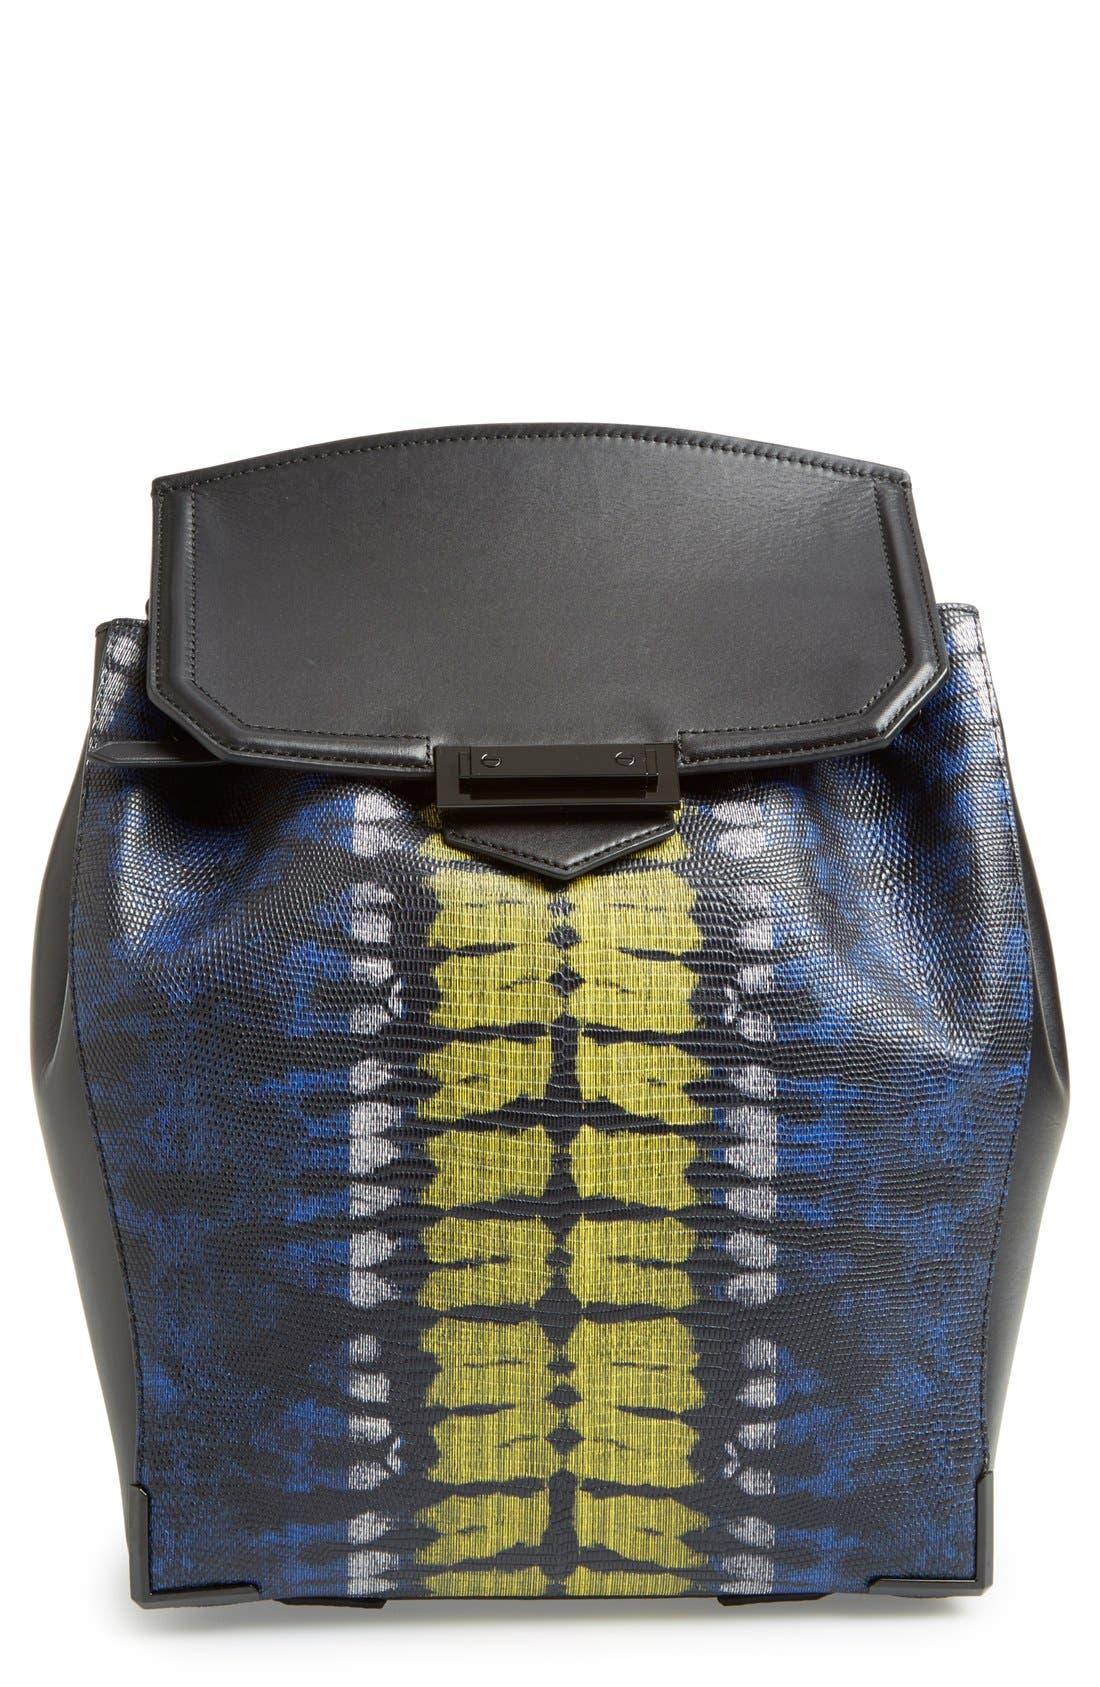 Alternate Image 1 Selected - Alexander Wang 'Prisma' Lizard Embossed Backpack